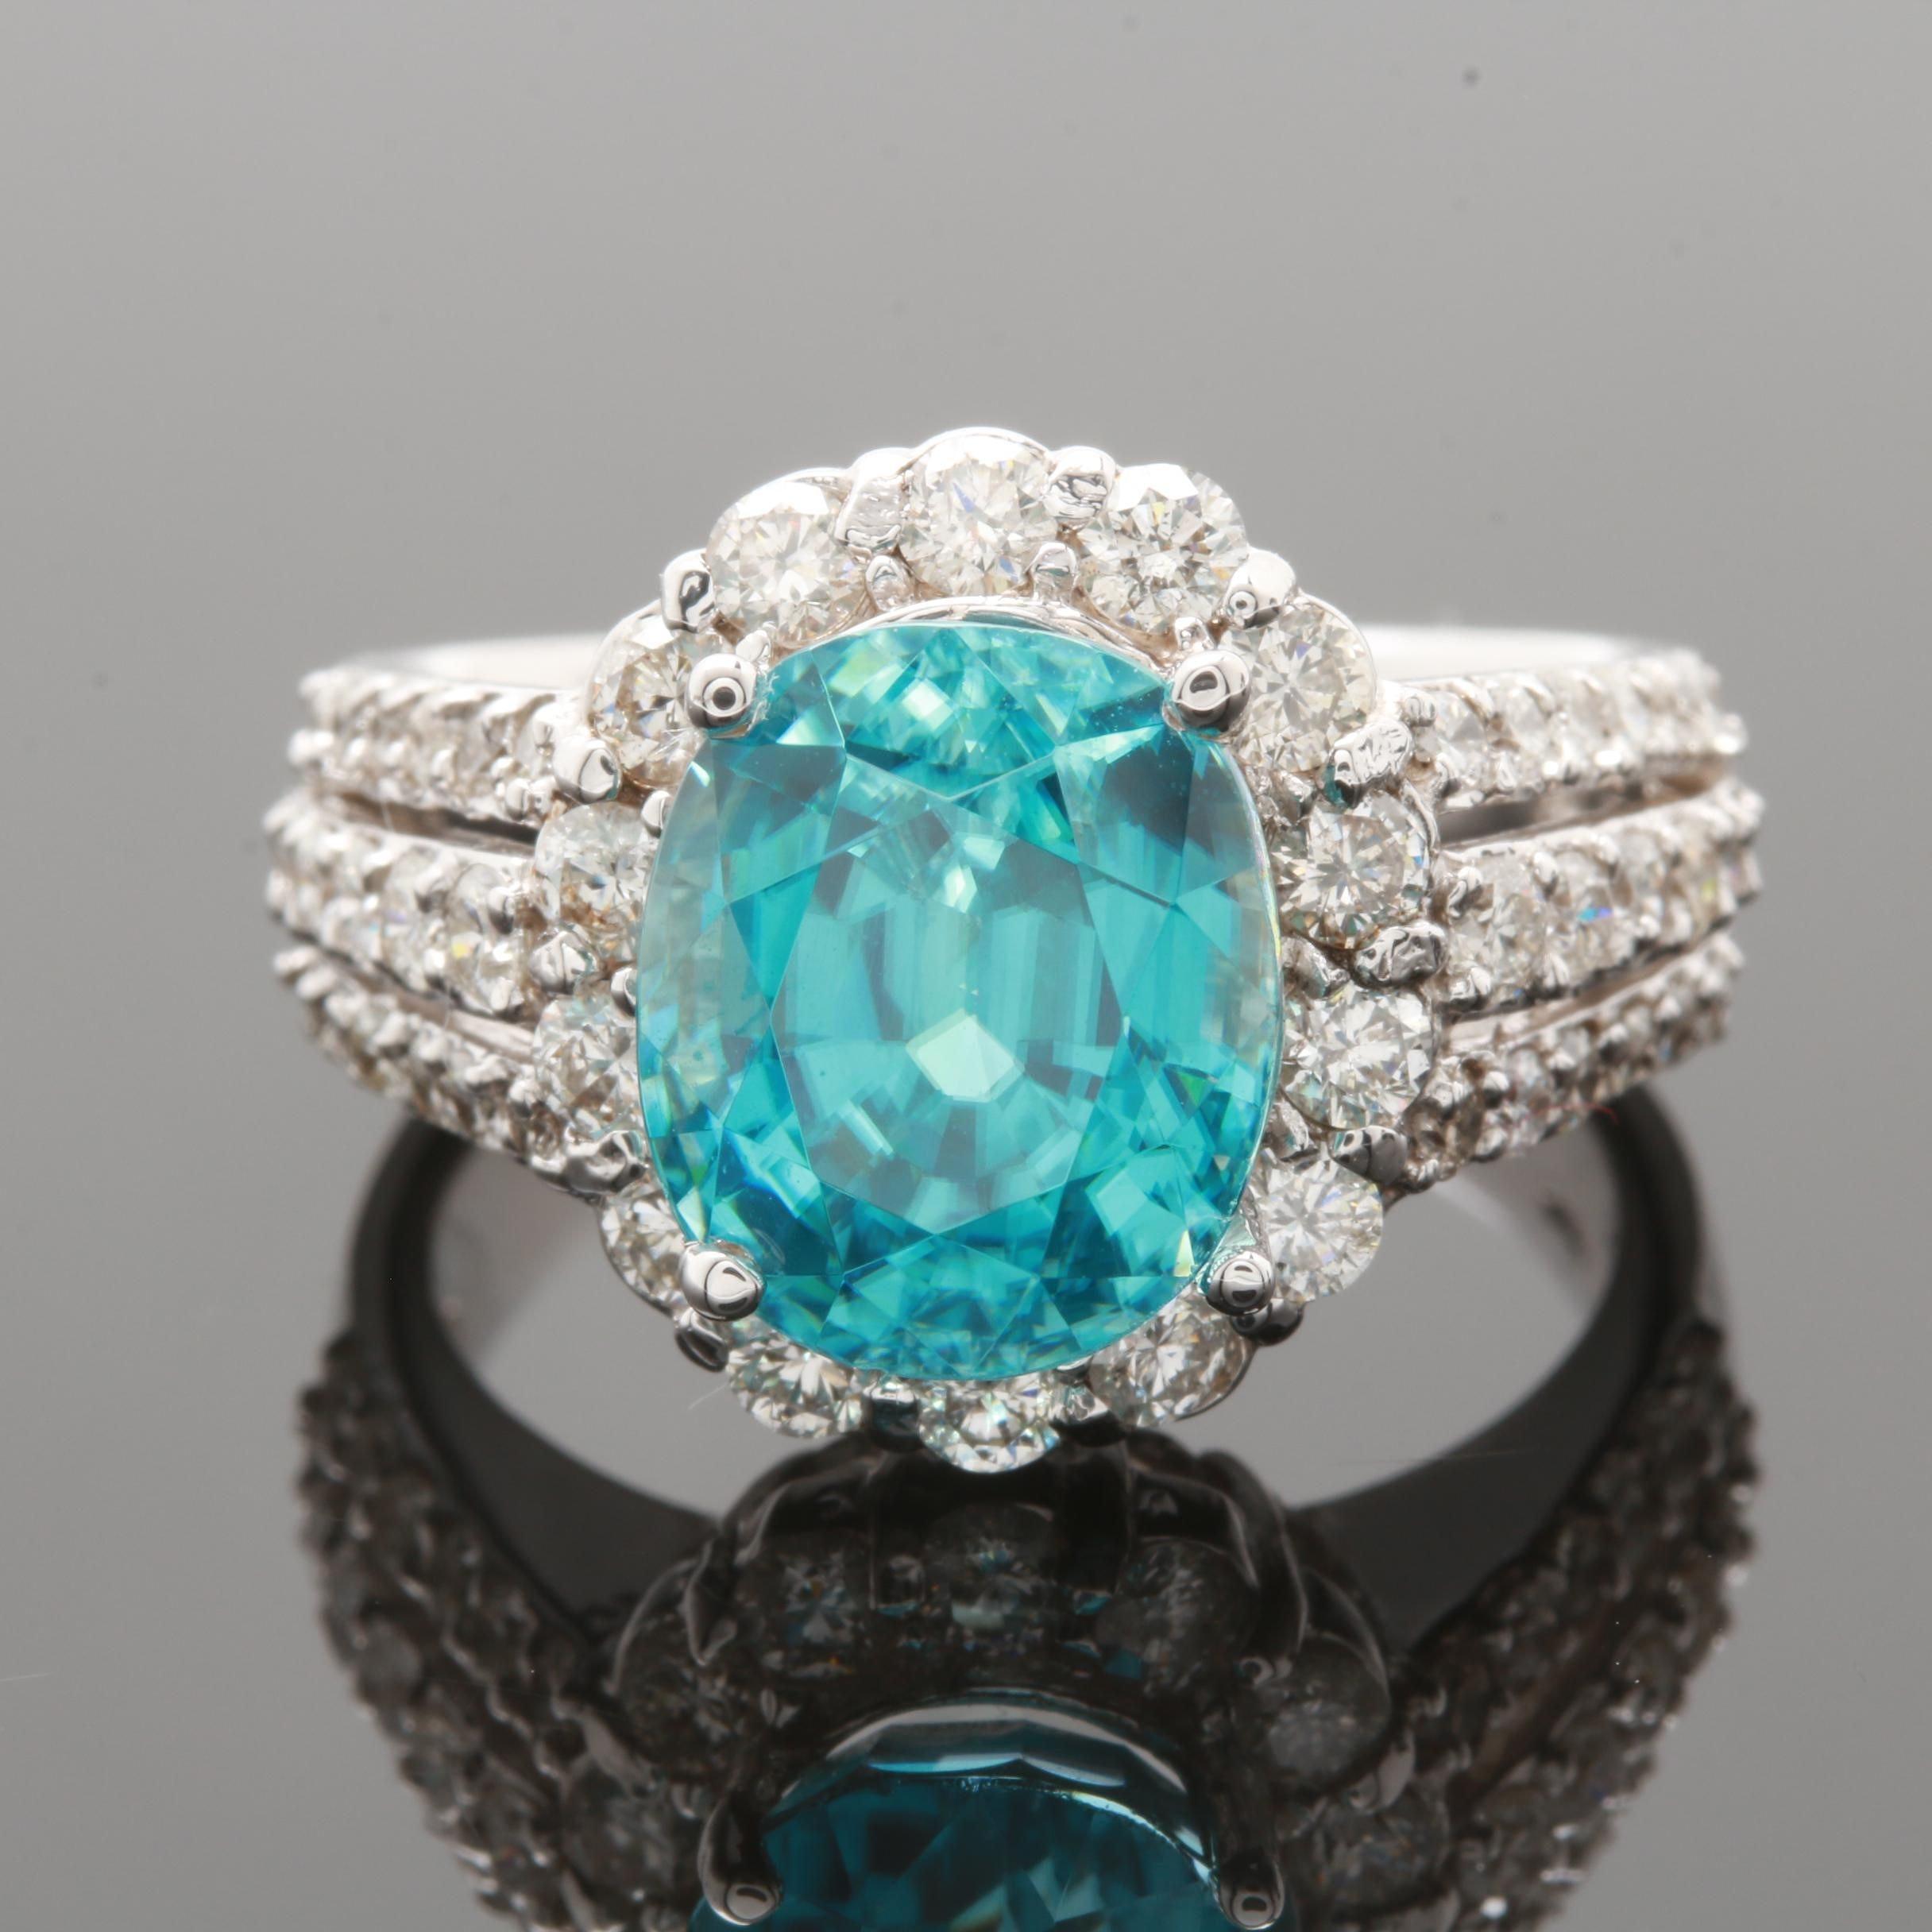 14K White Gold 7.01 CT Blue Zircon and 1.25 CTW Diamond Ring